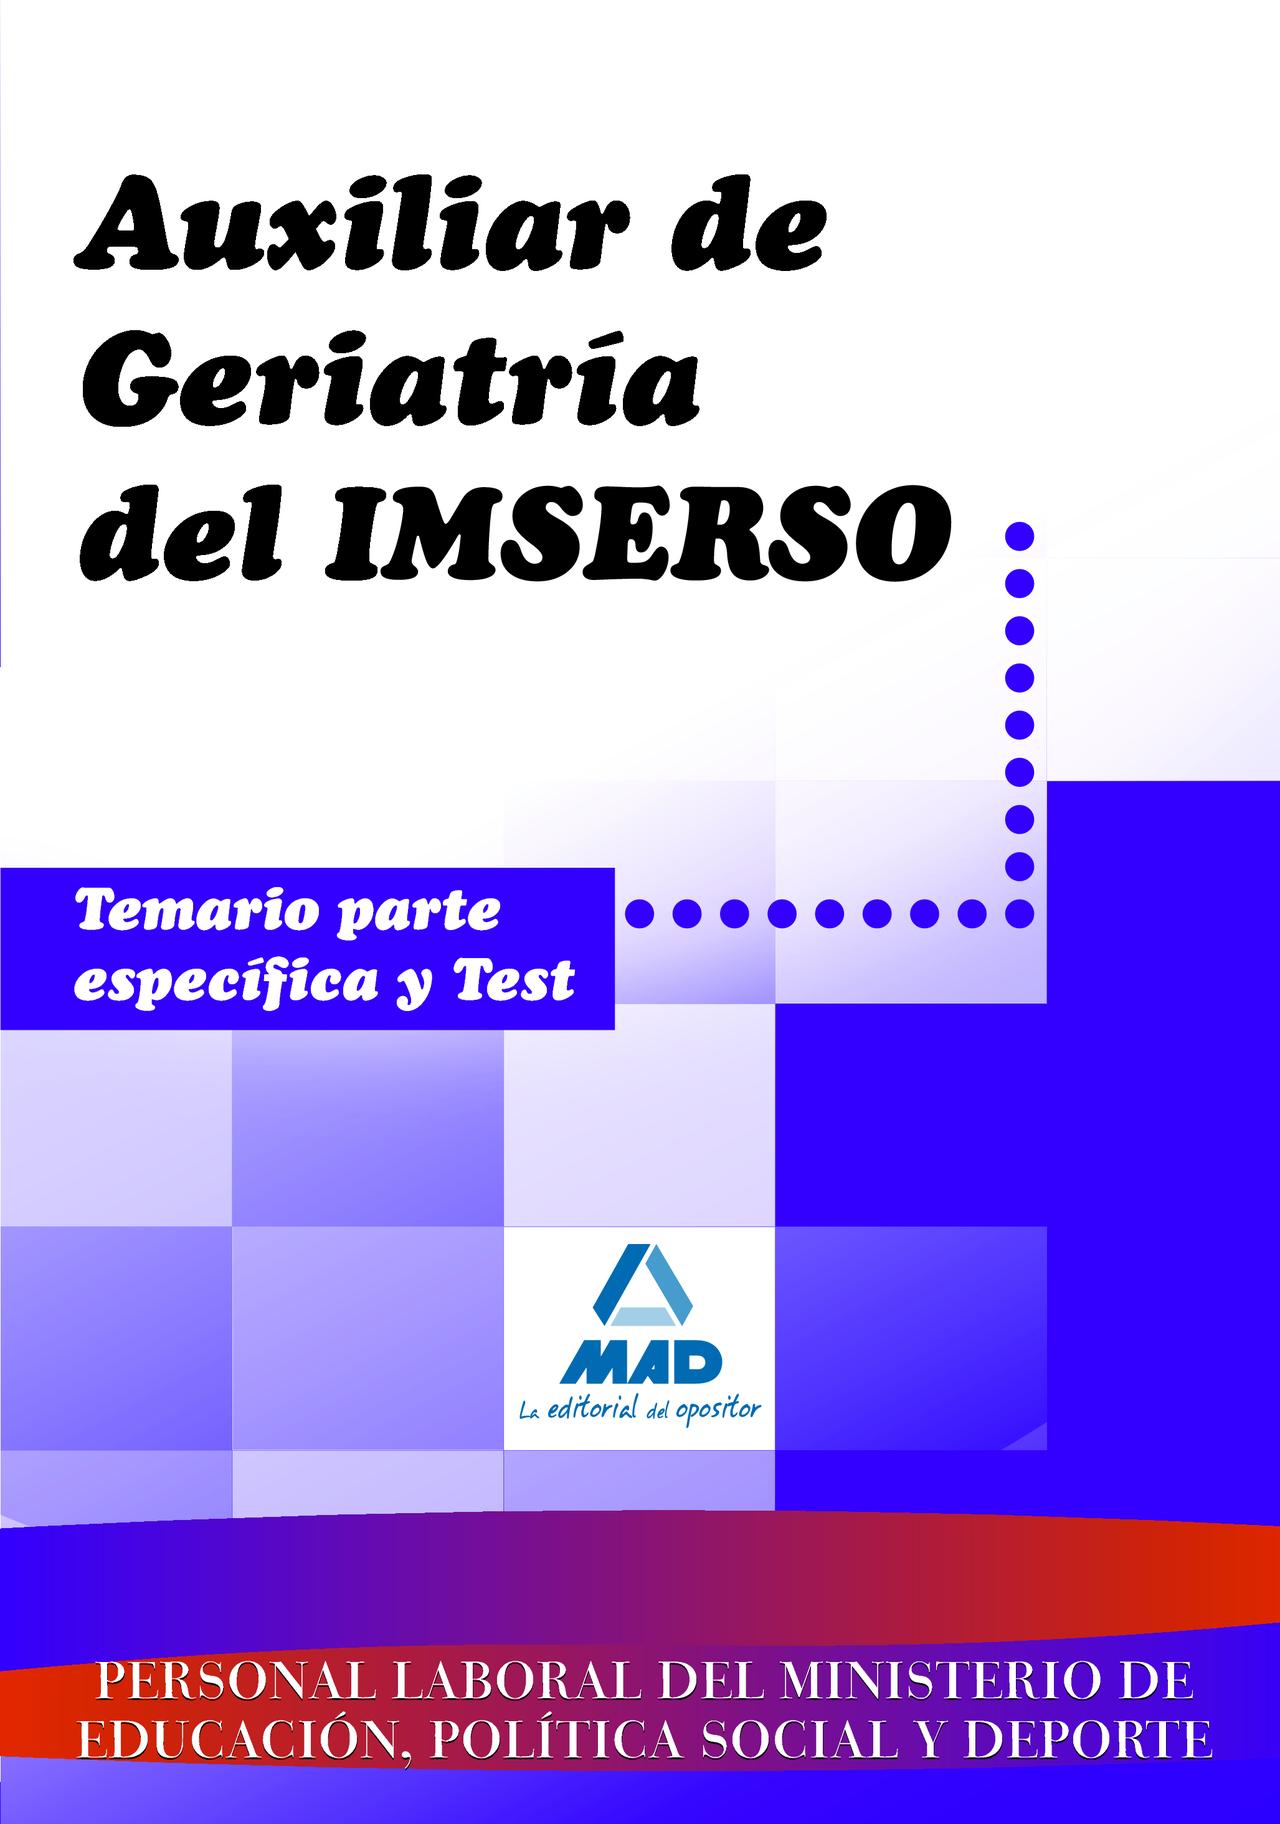 personal laboral del imserso. auxiliar de geriatria. temario part e especifica y test-9788467611465